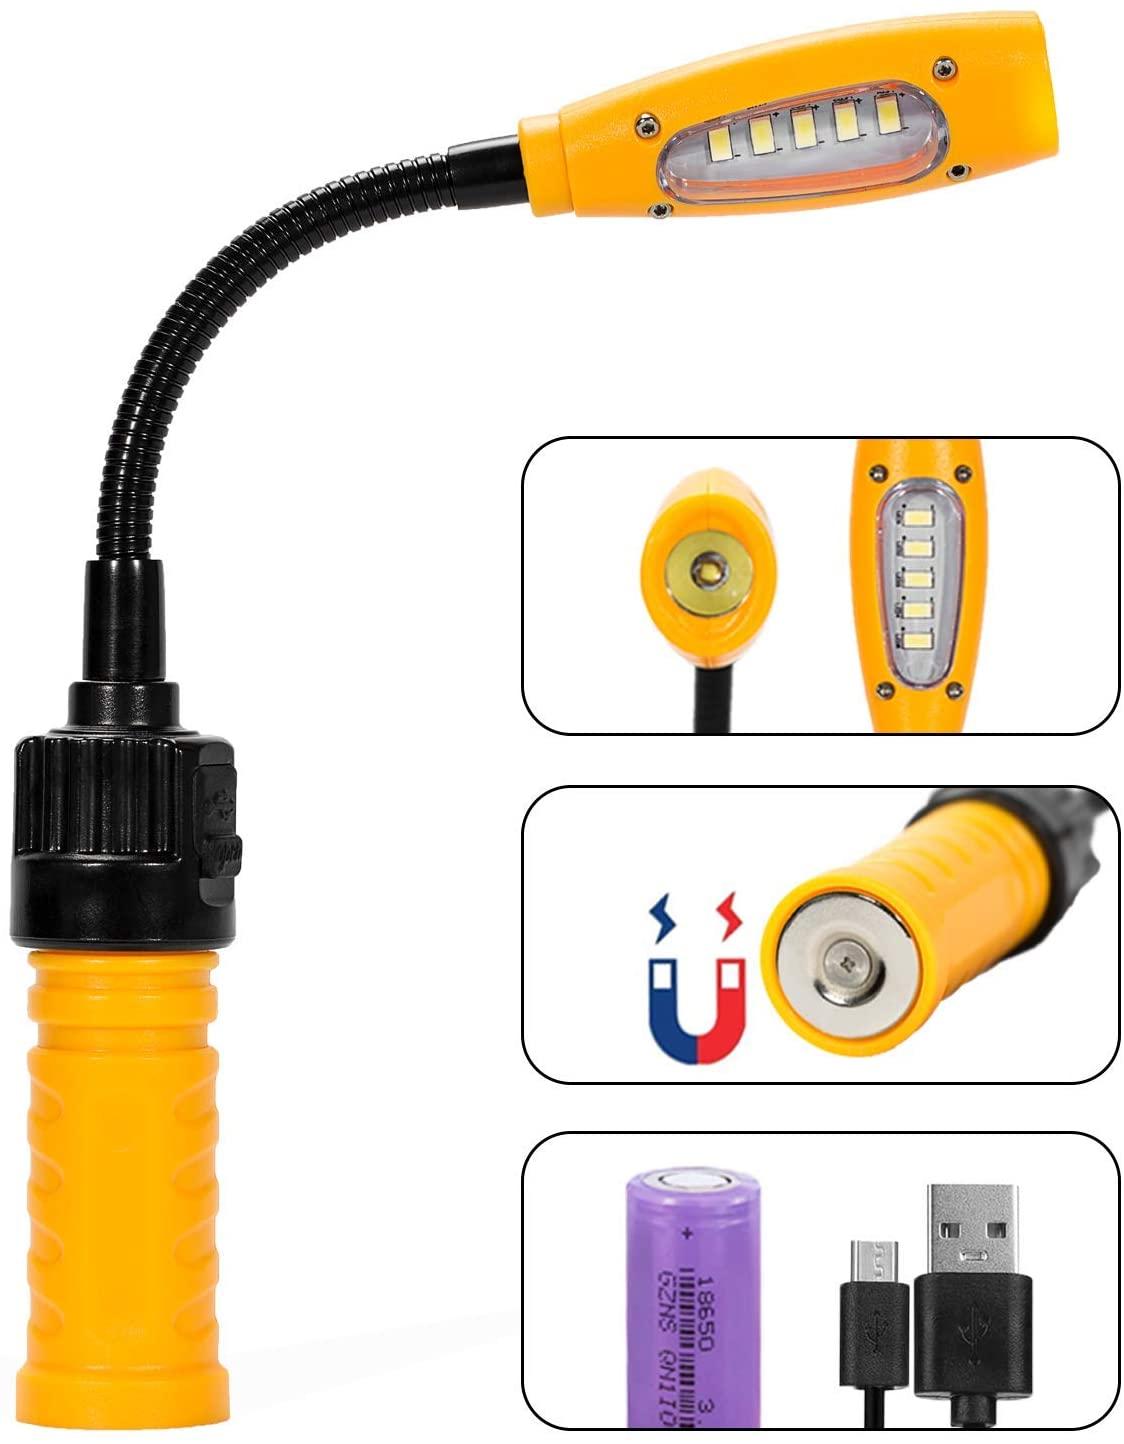 eLusefor Bright Cordless Work Light, USB Rechargeable, COB LED Spotlight, Powerful Magnetic Base, Gooseneck, Hanging Ring & Portable Travel Case, 400 Lumens, Battery Powered, 3 Lighting Modes